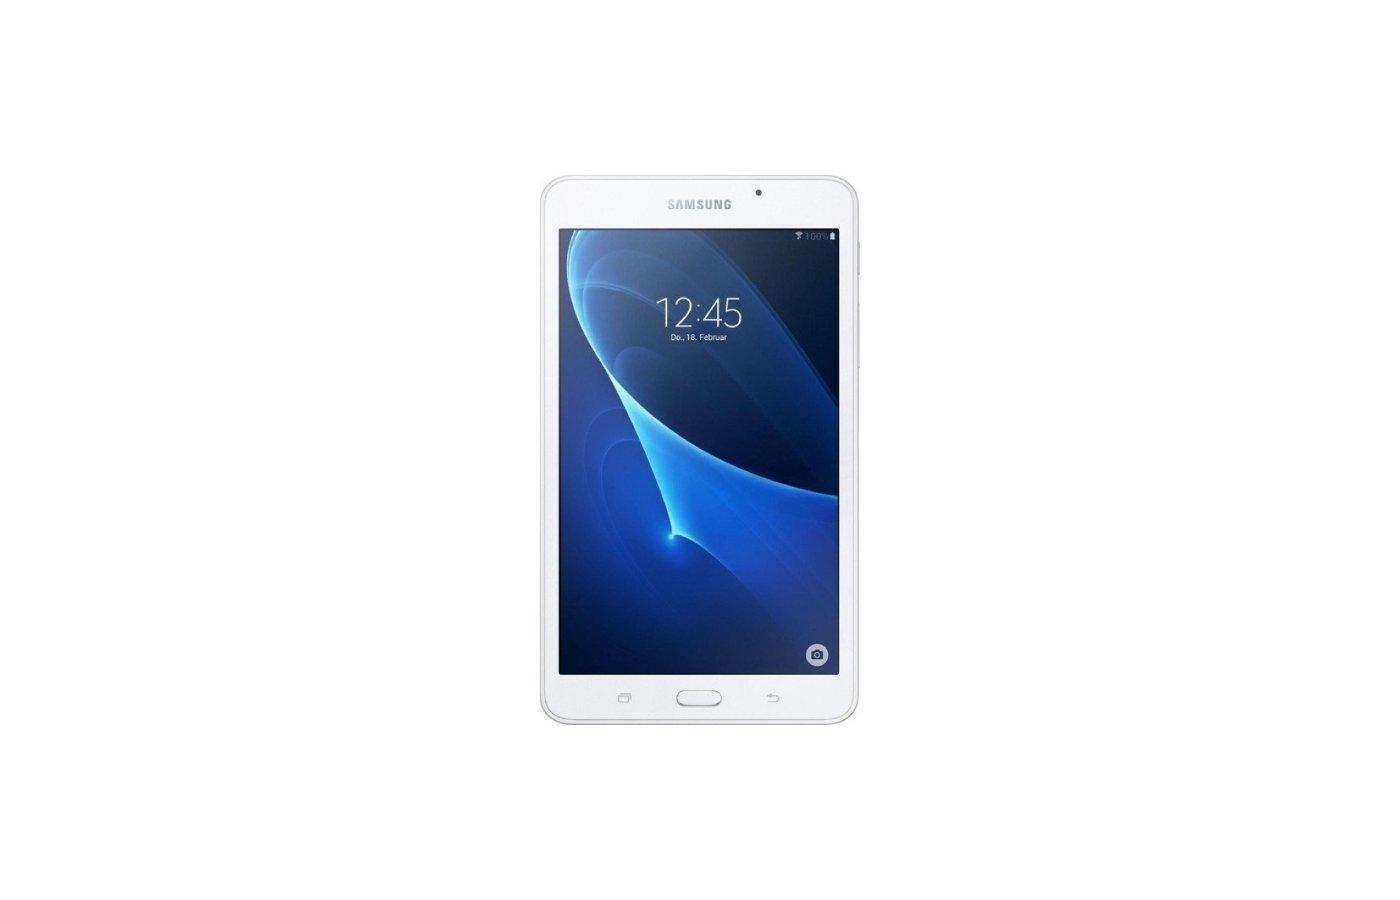 Планшет Samsung GALAXY Tab A 7.0 /SM-T280NZWASER/Wi-Fi 8GB White